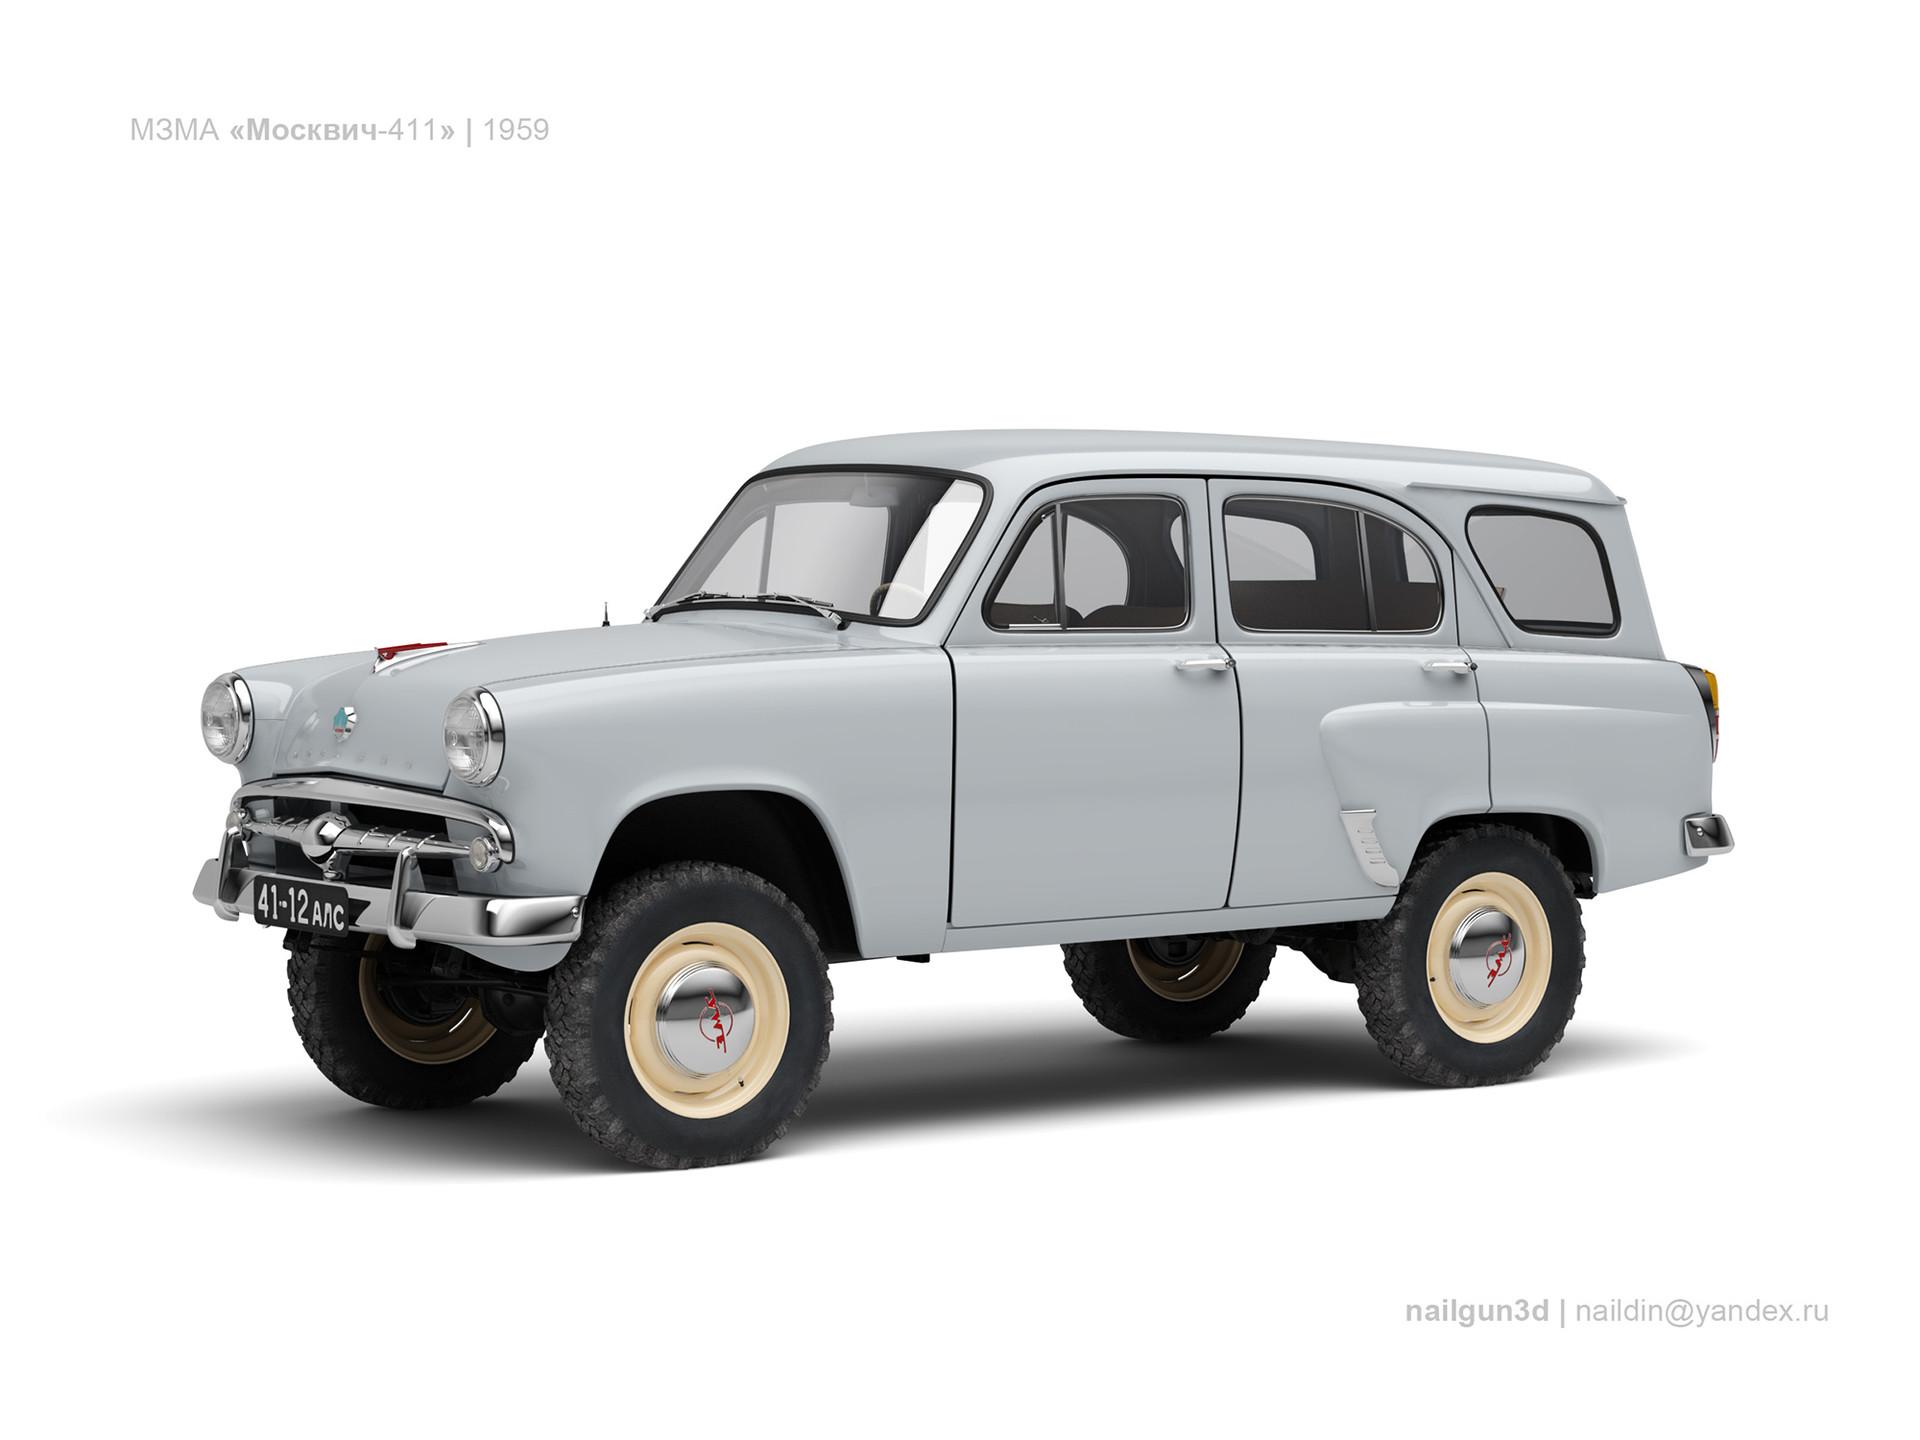 Nail khusnutdinov ussr moskvich 411 1959 0